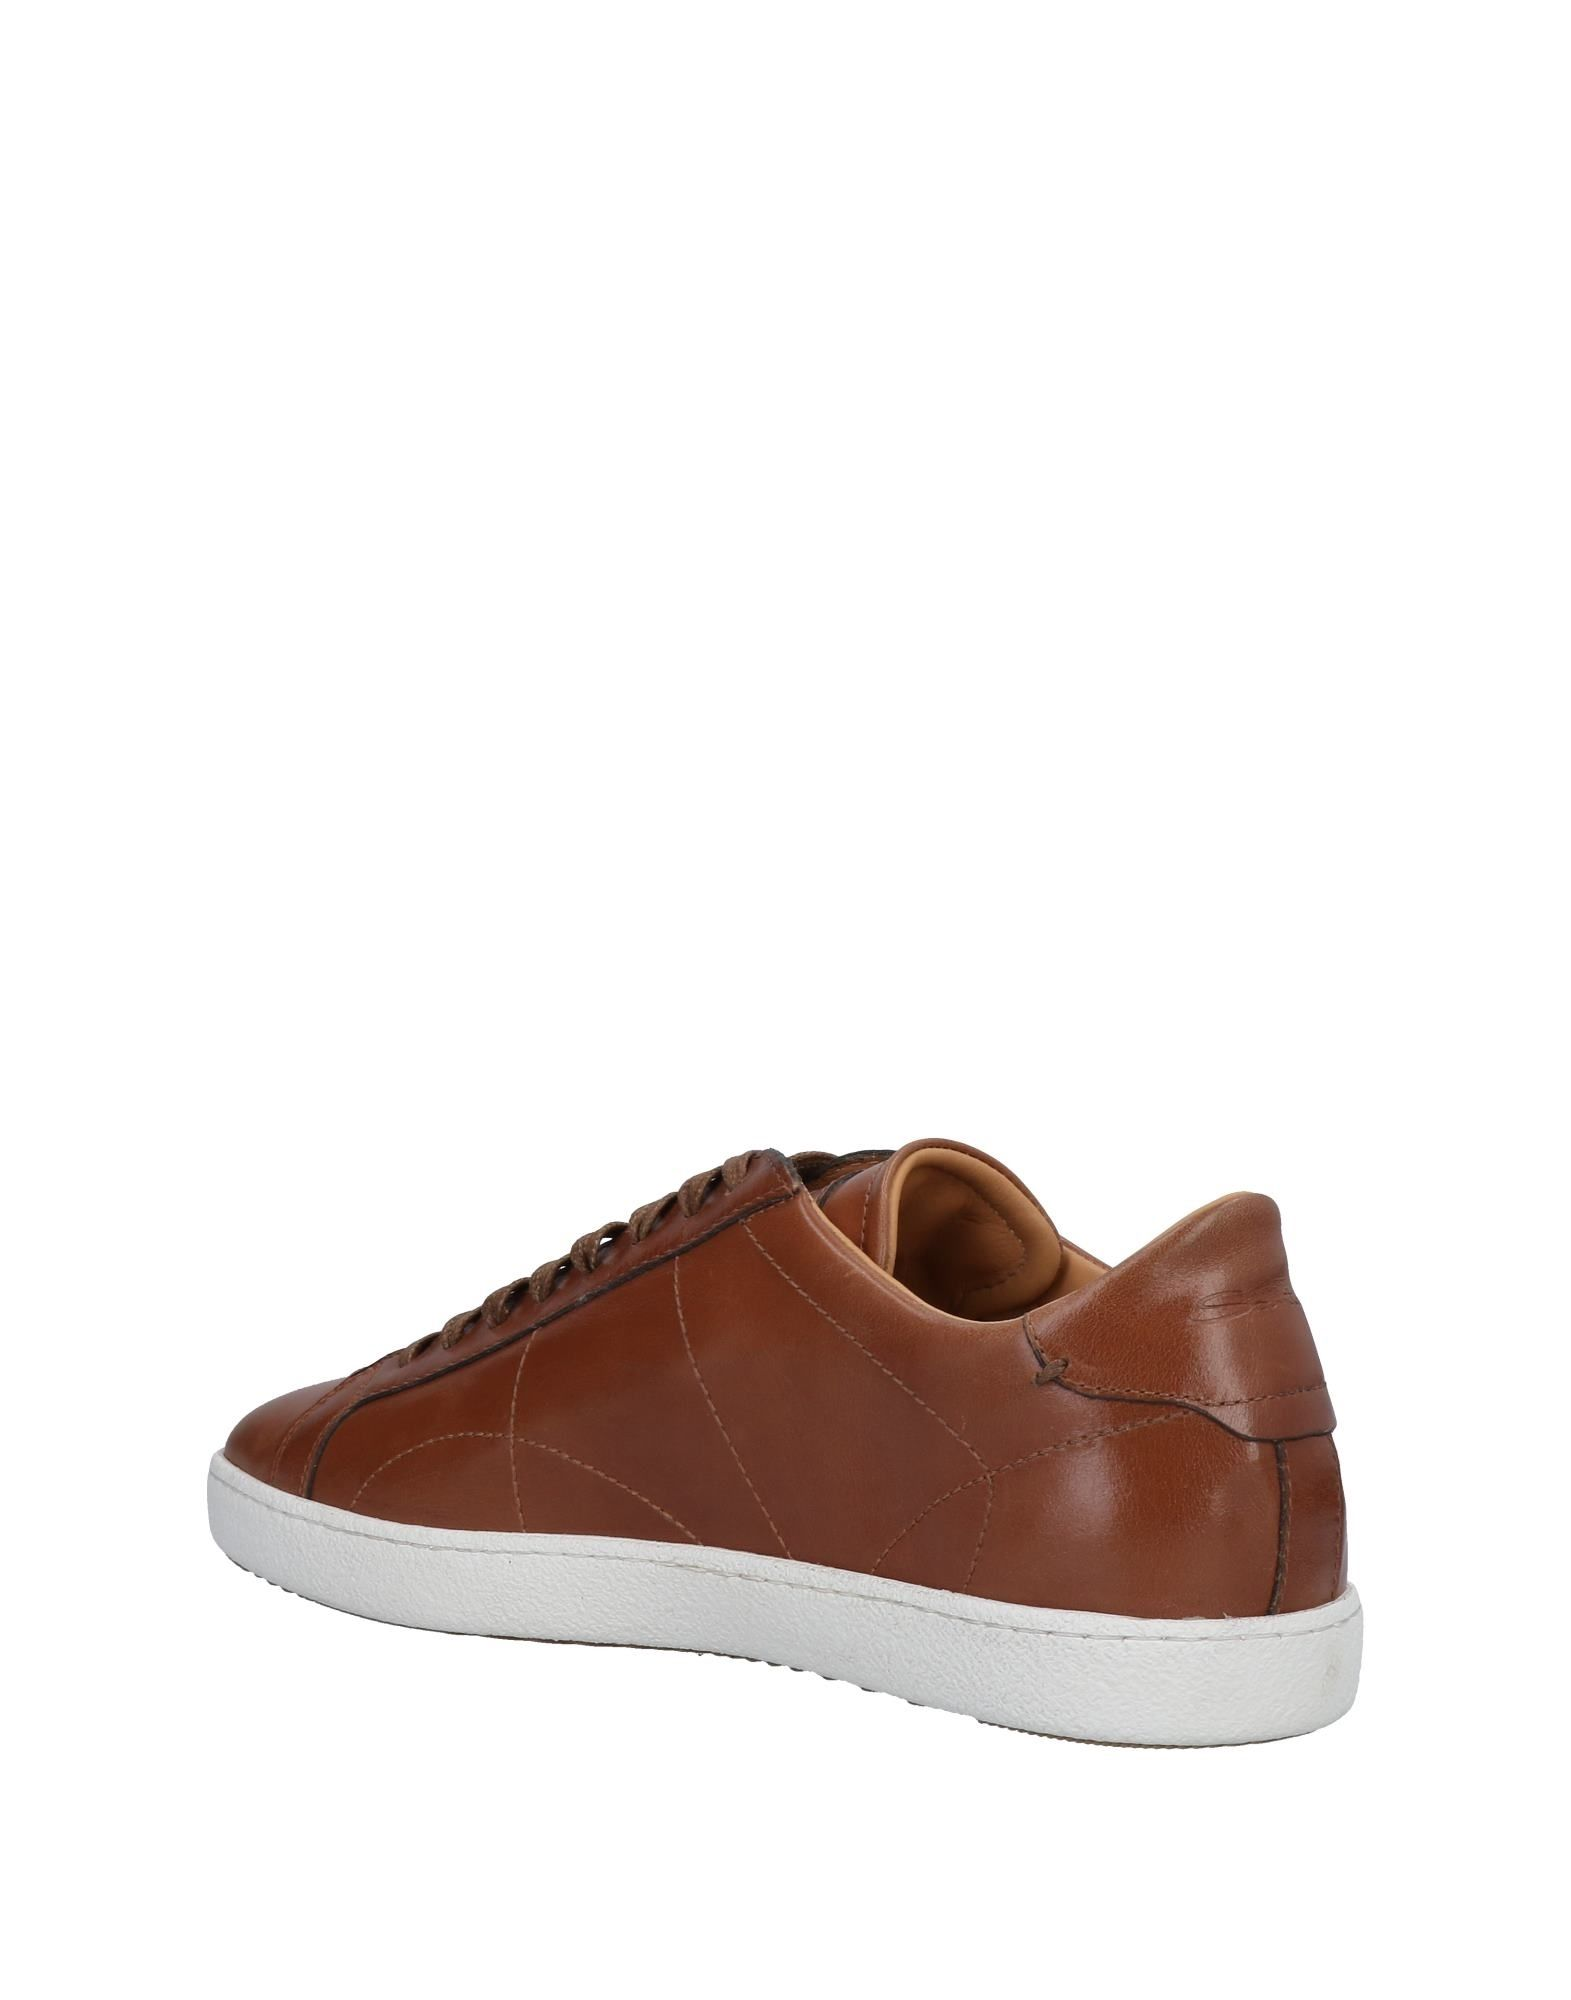 Santoni 11479466SA Sneakers Herren  11479466SA Santoni Gute Qualität beliebte Schuhe a99614